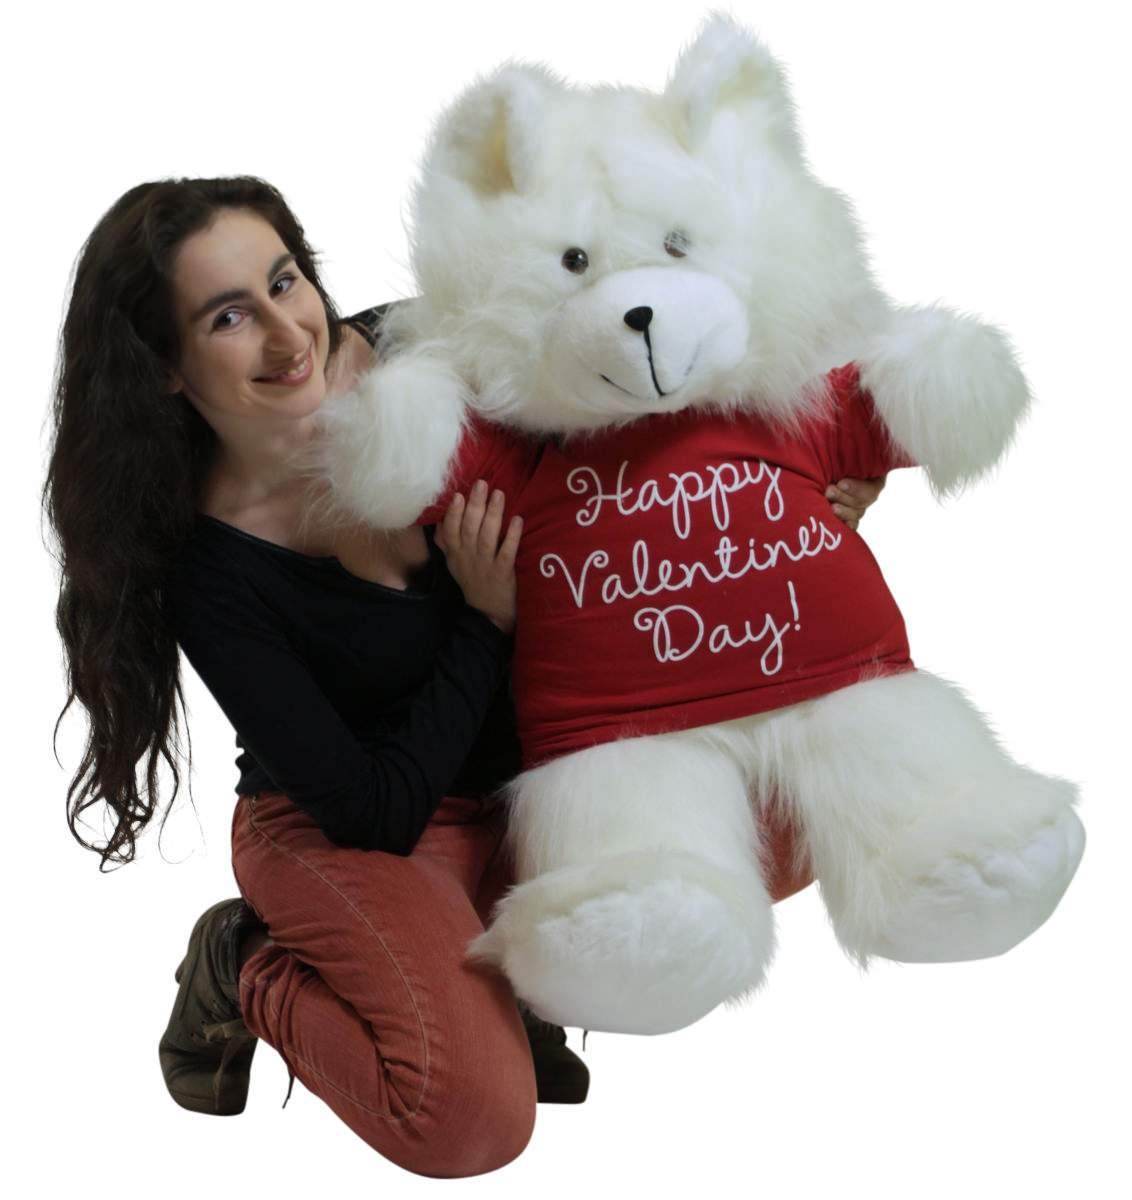 Happy Valentines Day Giant White 36 Inch Teddy Bear Soft Wears